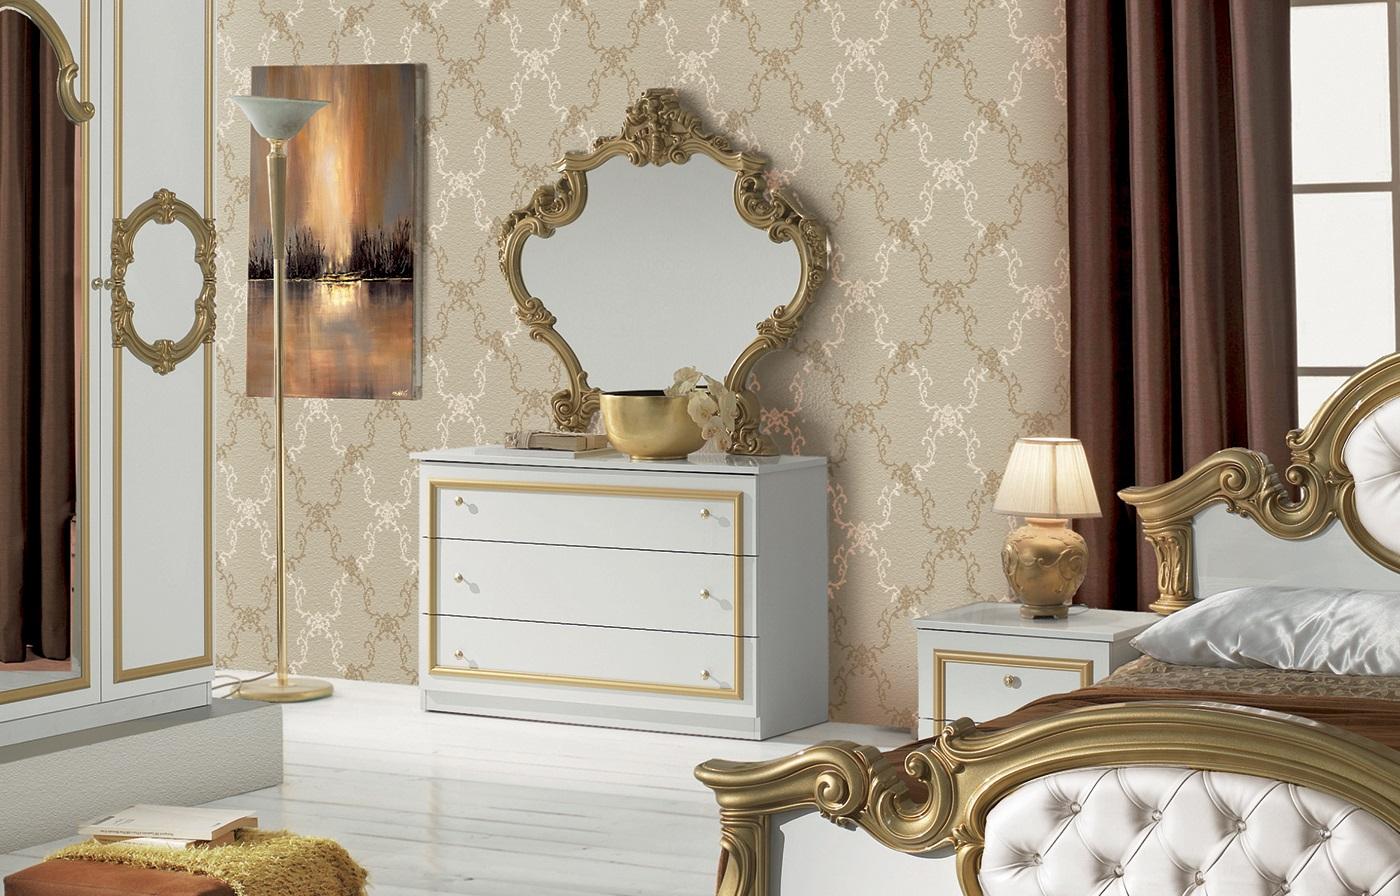 ... Schlafzimmer Barocco In Weiss Gold Barock Design